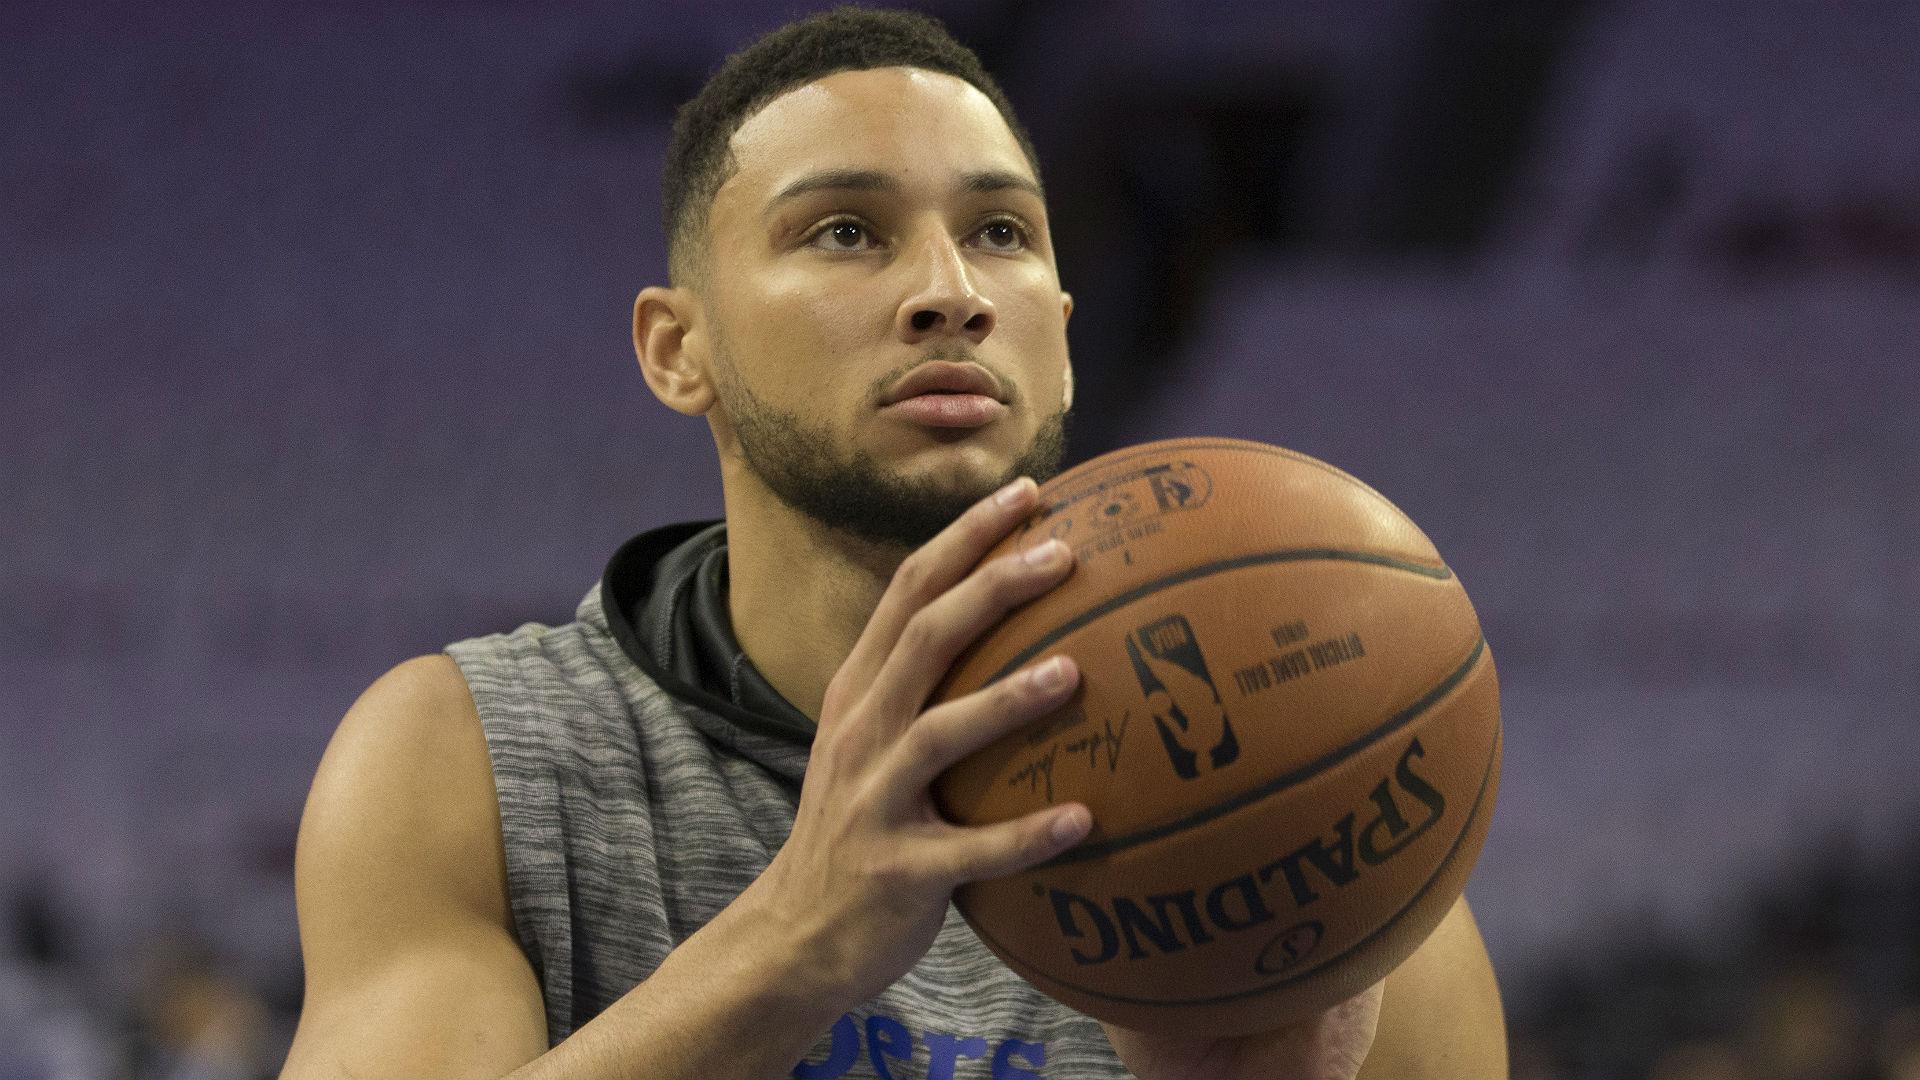 NBA playoffs 2019: 'Missing' poster in Brooklyn mocks Ben Simmons' jump shot